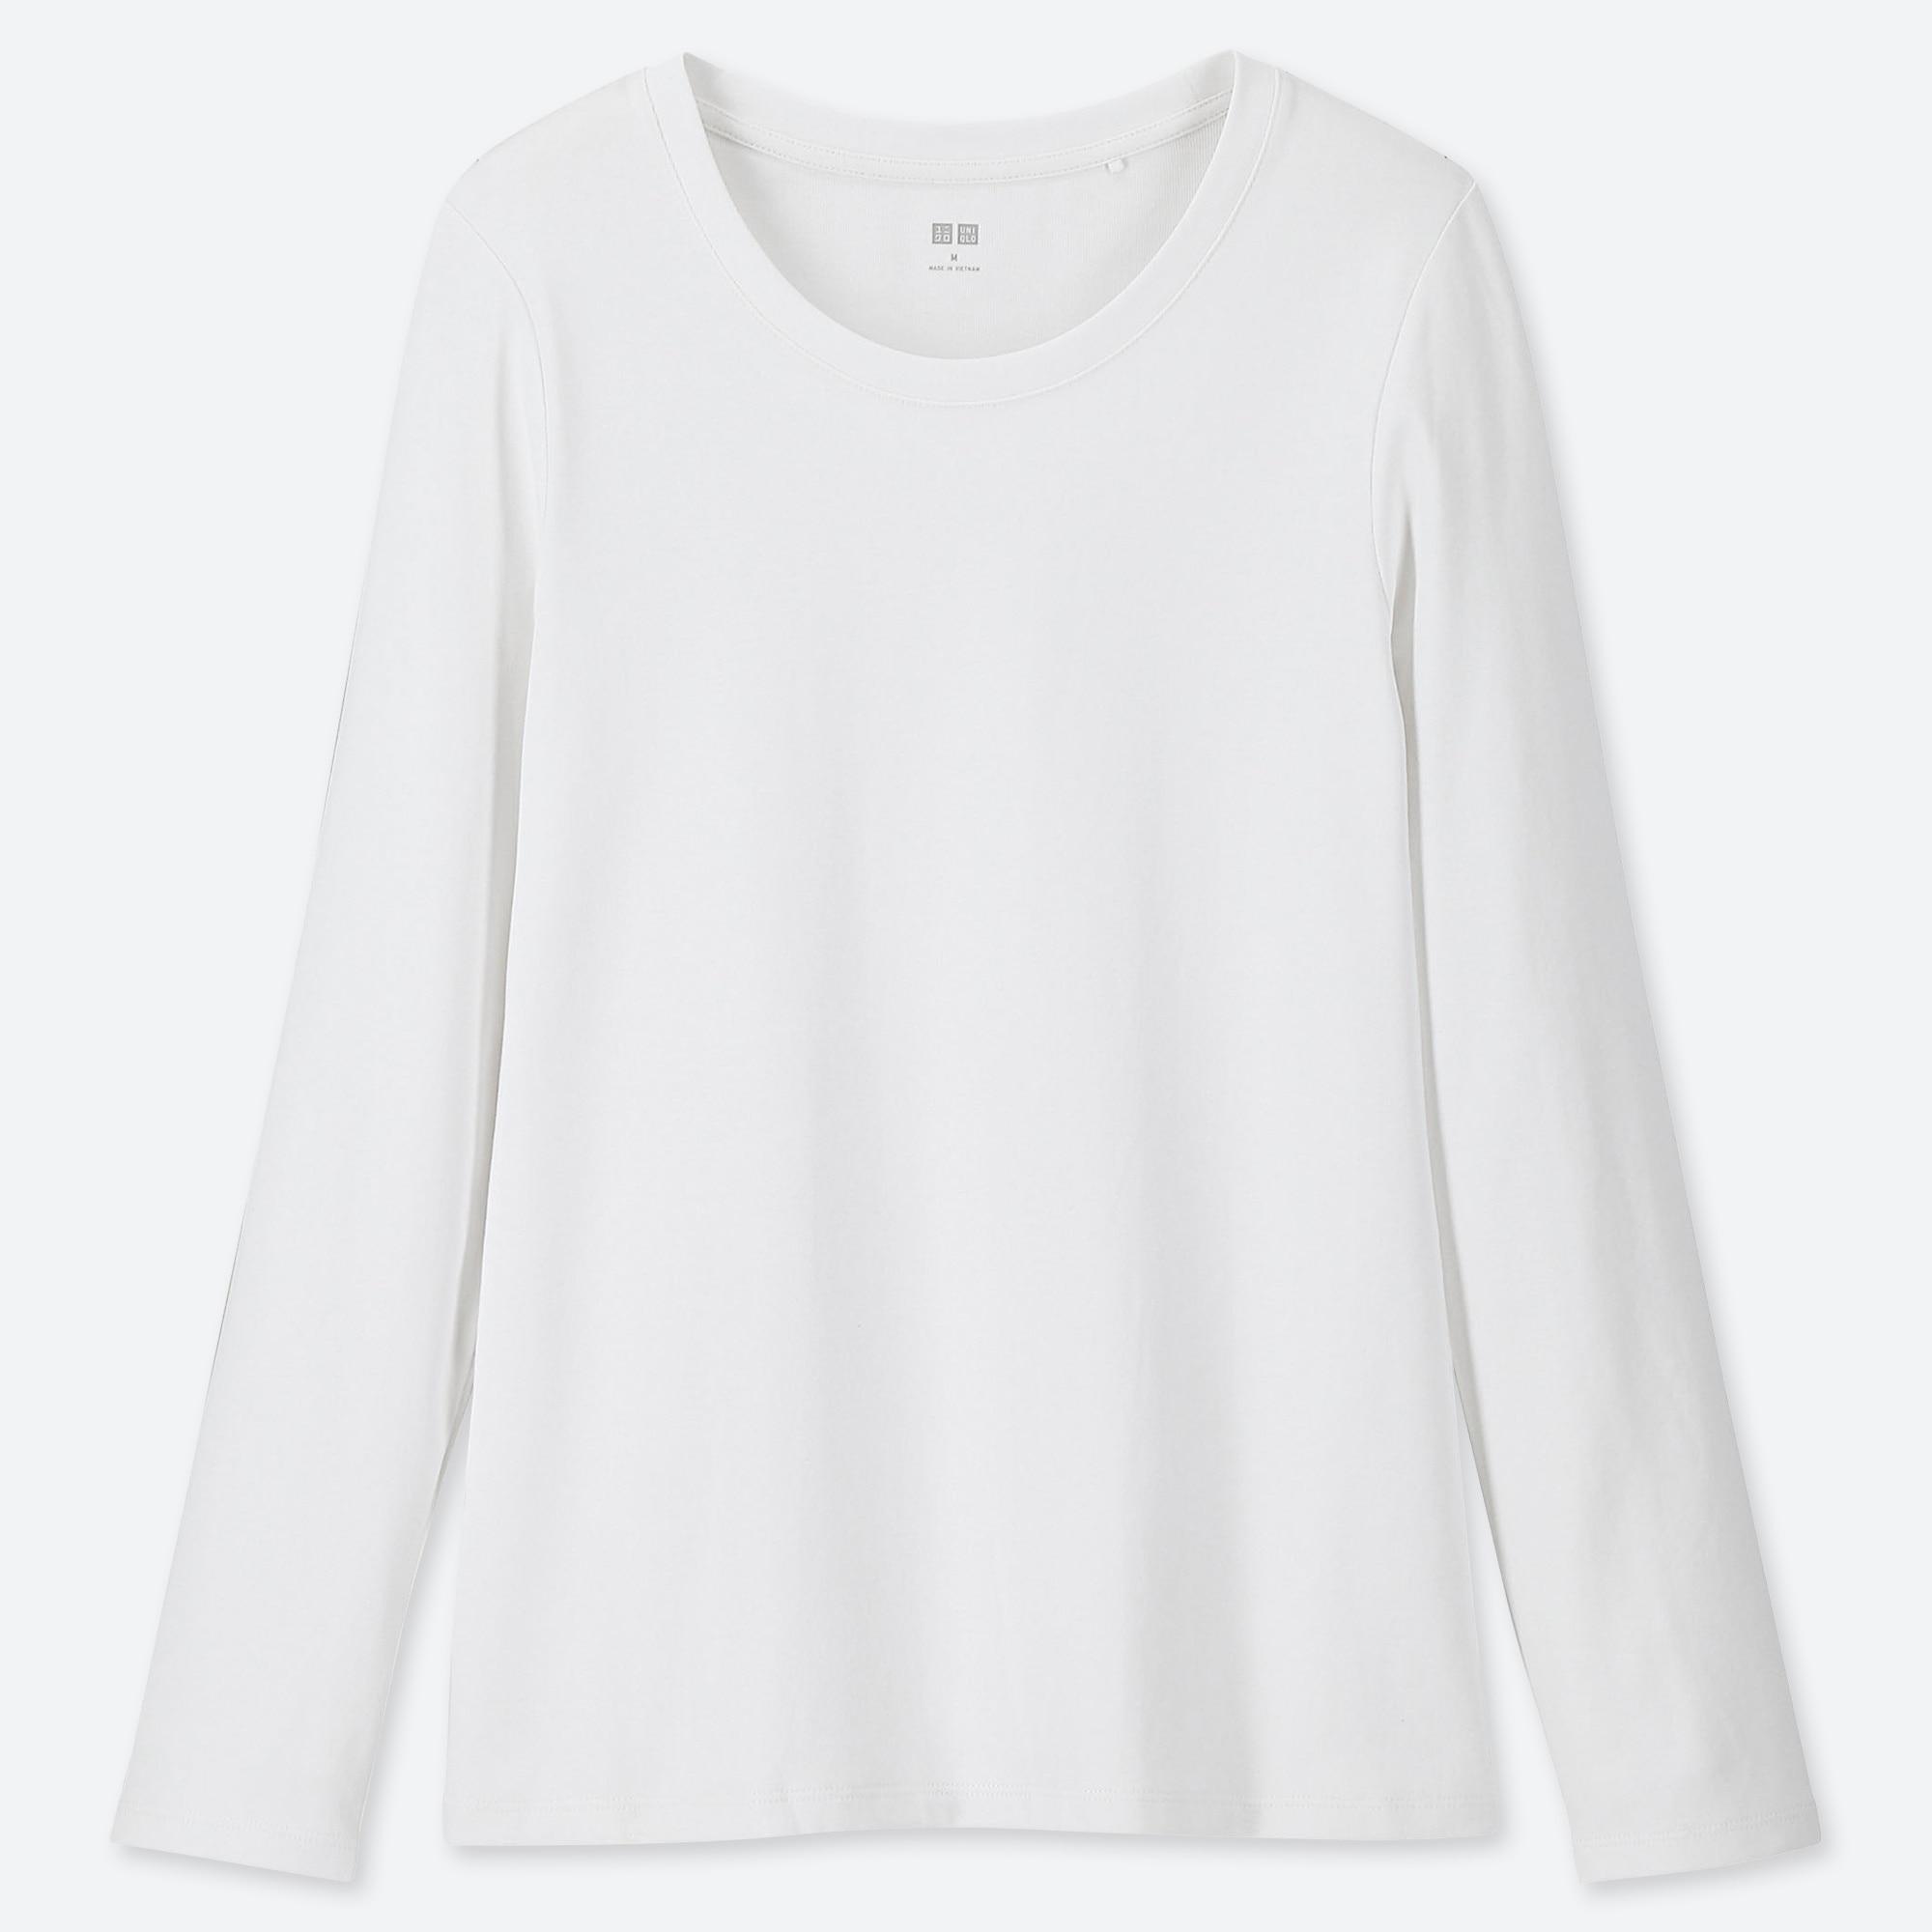 WOMEN 1*1 RIBBED COTTON CREW NECK LONG-SLEEVE T-SHIRT